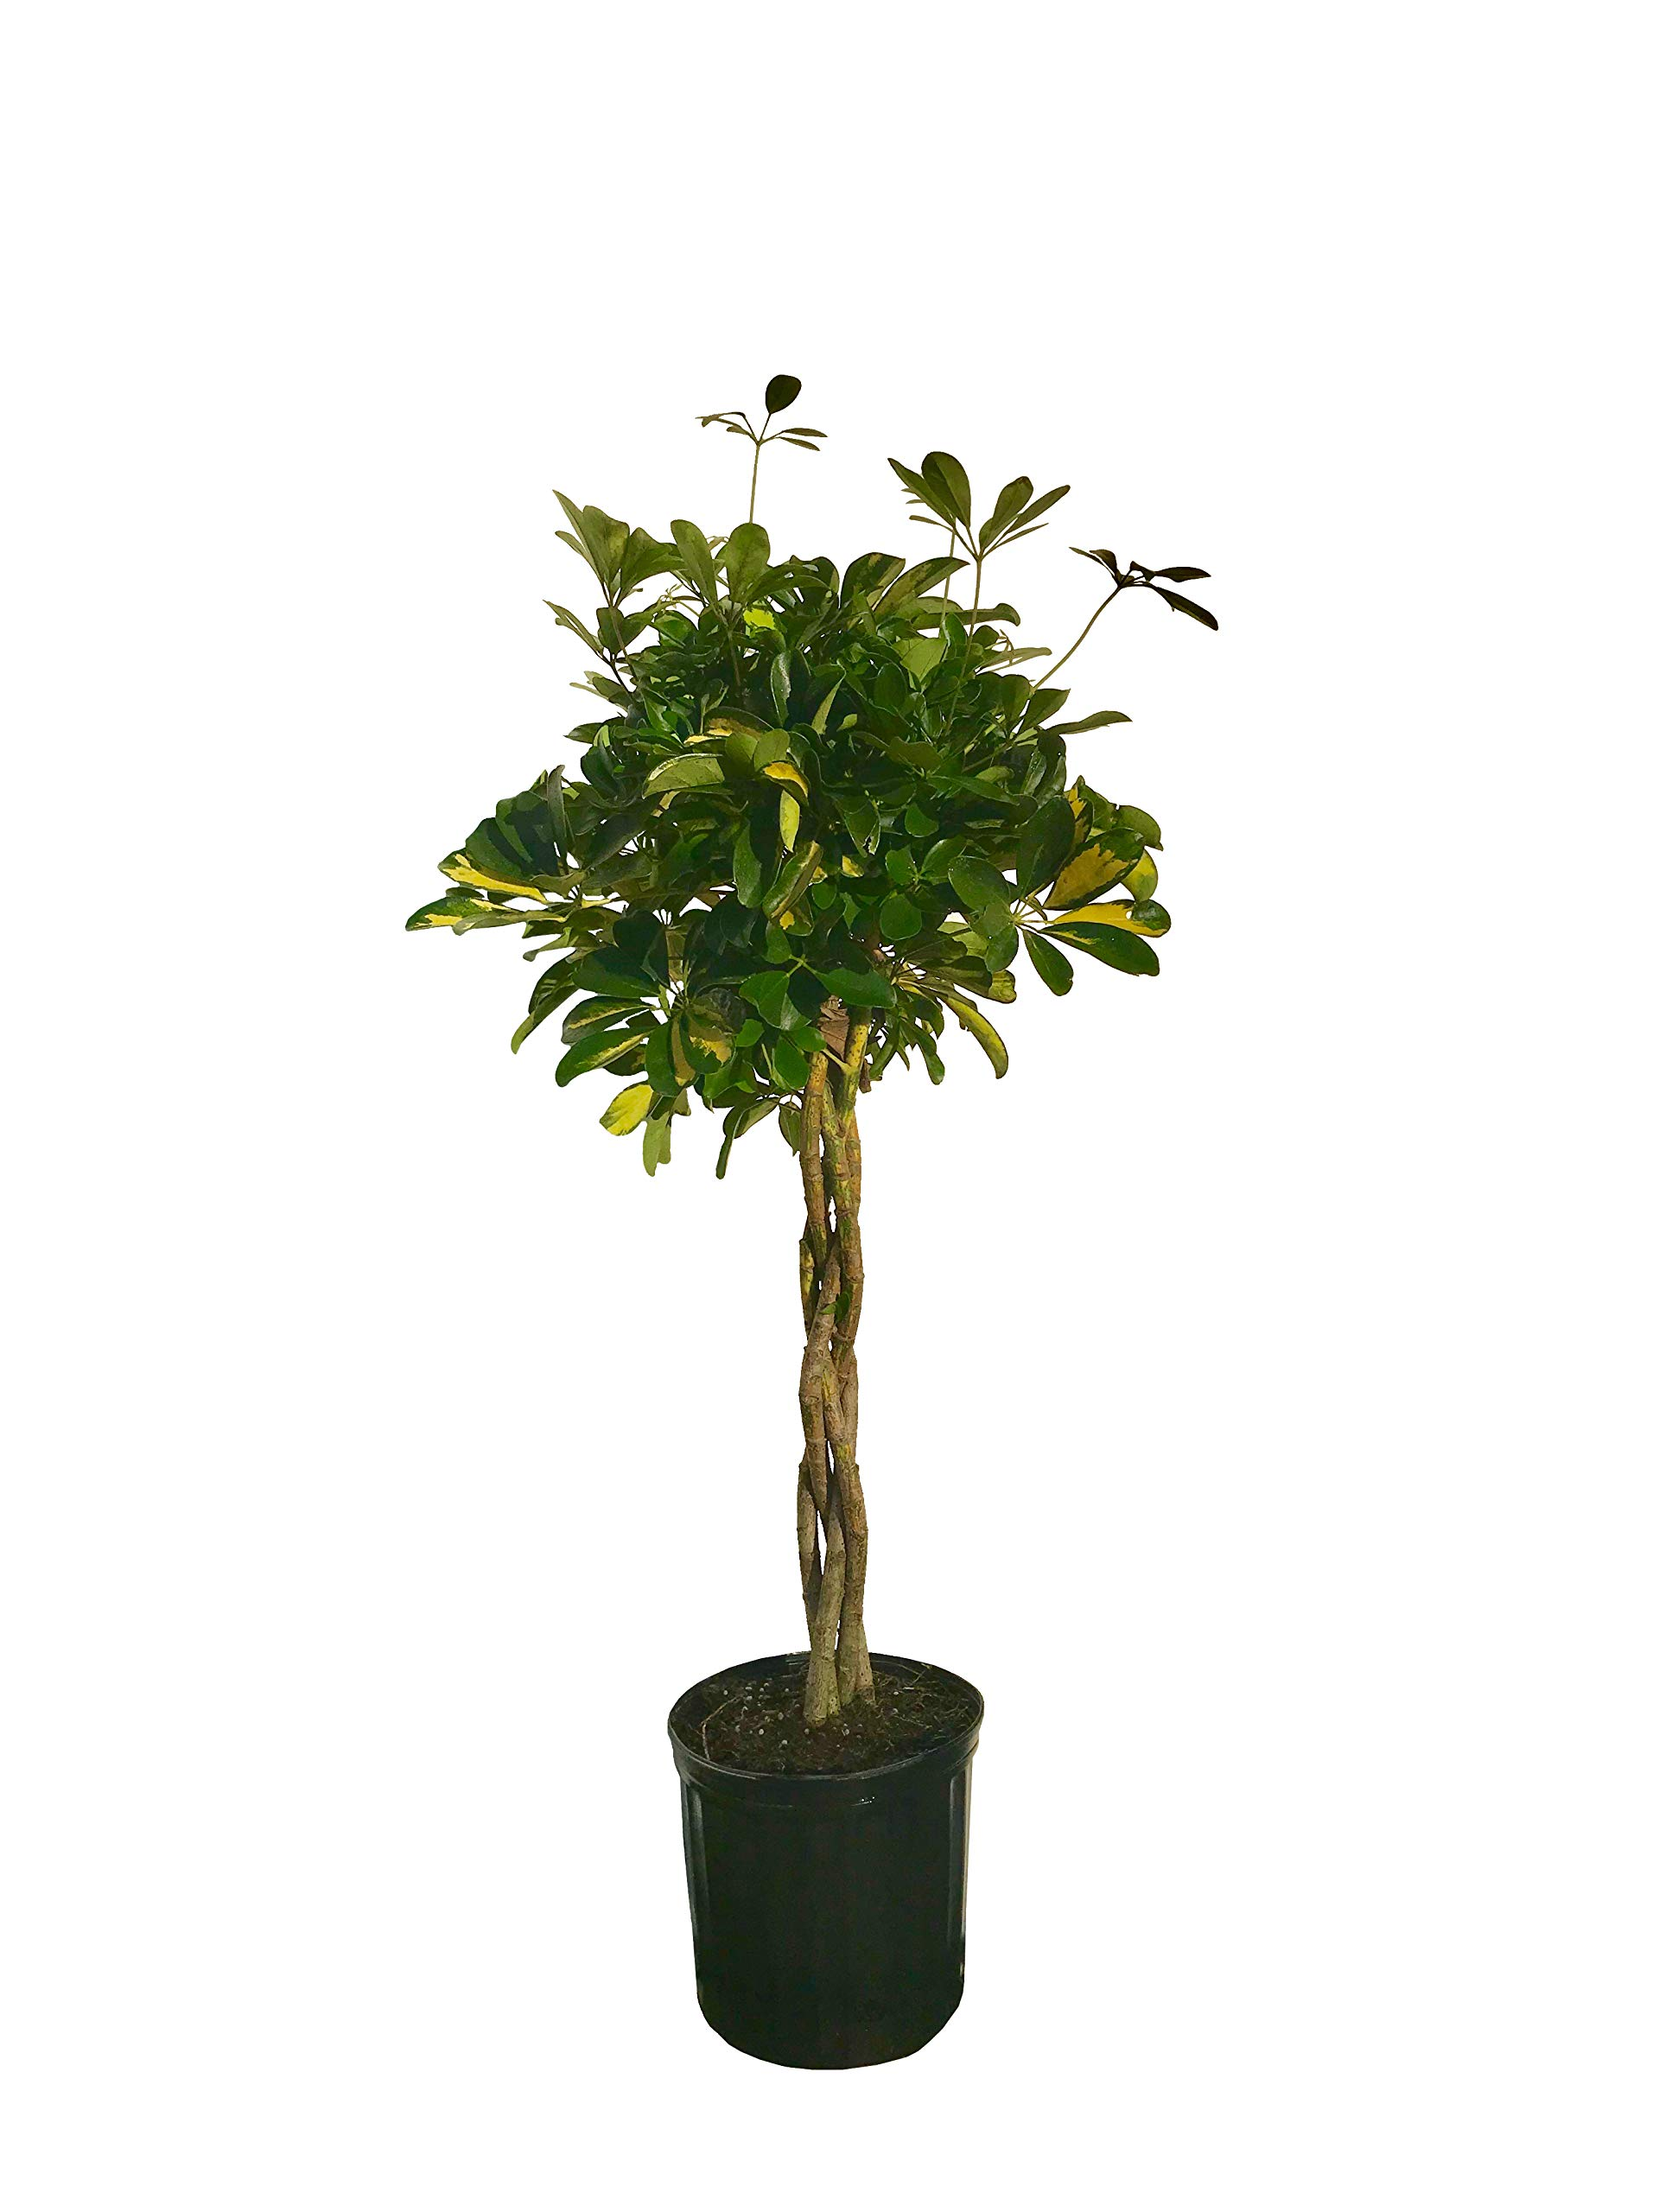 Umbrella Tree - 'Gold Capella' Live Braided Schefflera Arboricola - Florist Quality - Beautiful Indoor Tree - 3 Feet Tall by Florida Foliage